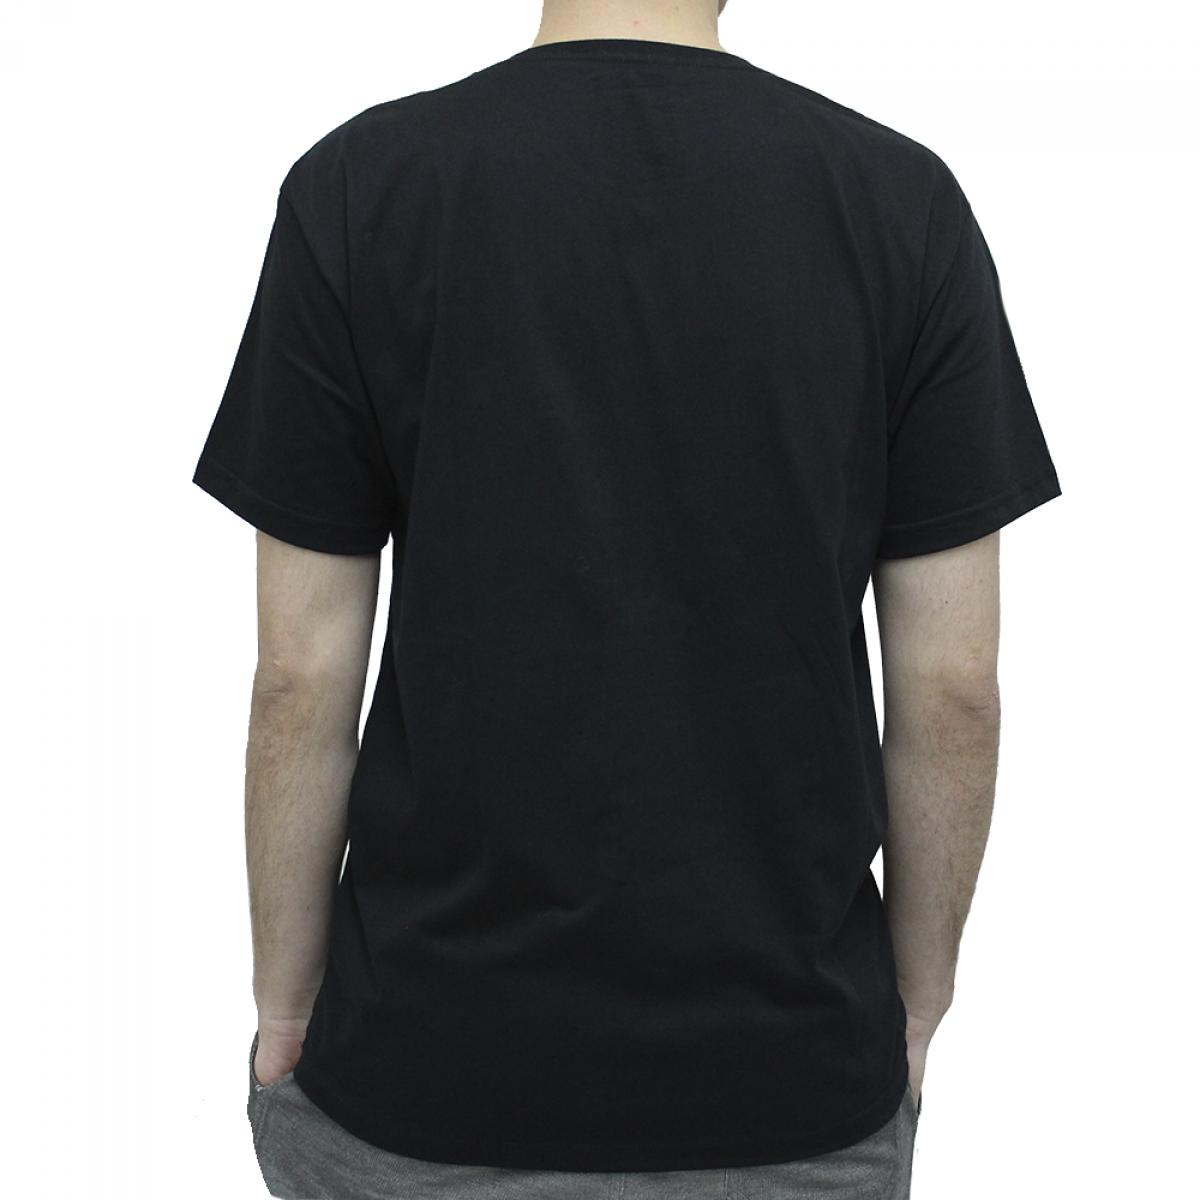 Camiseta Terabyteshop, Unisex, Manga Curta, Algodão, Preto e Laranja, Logo (G)